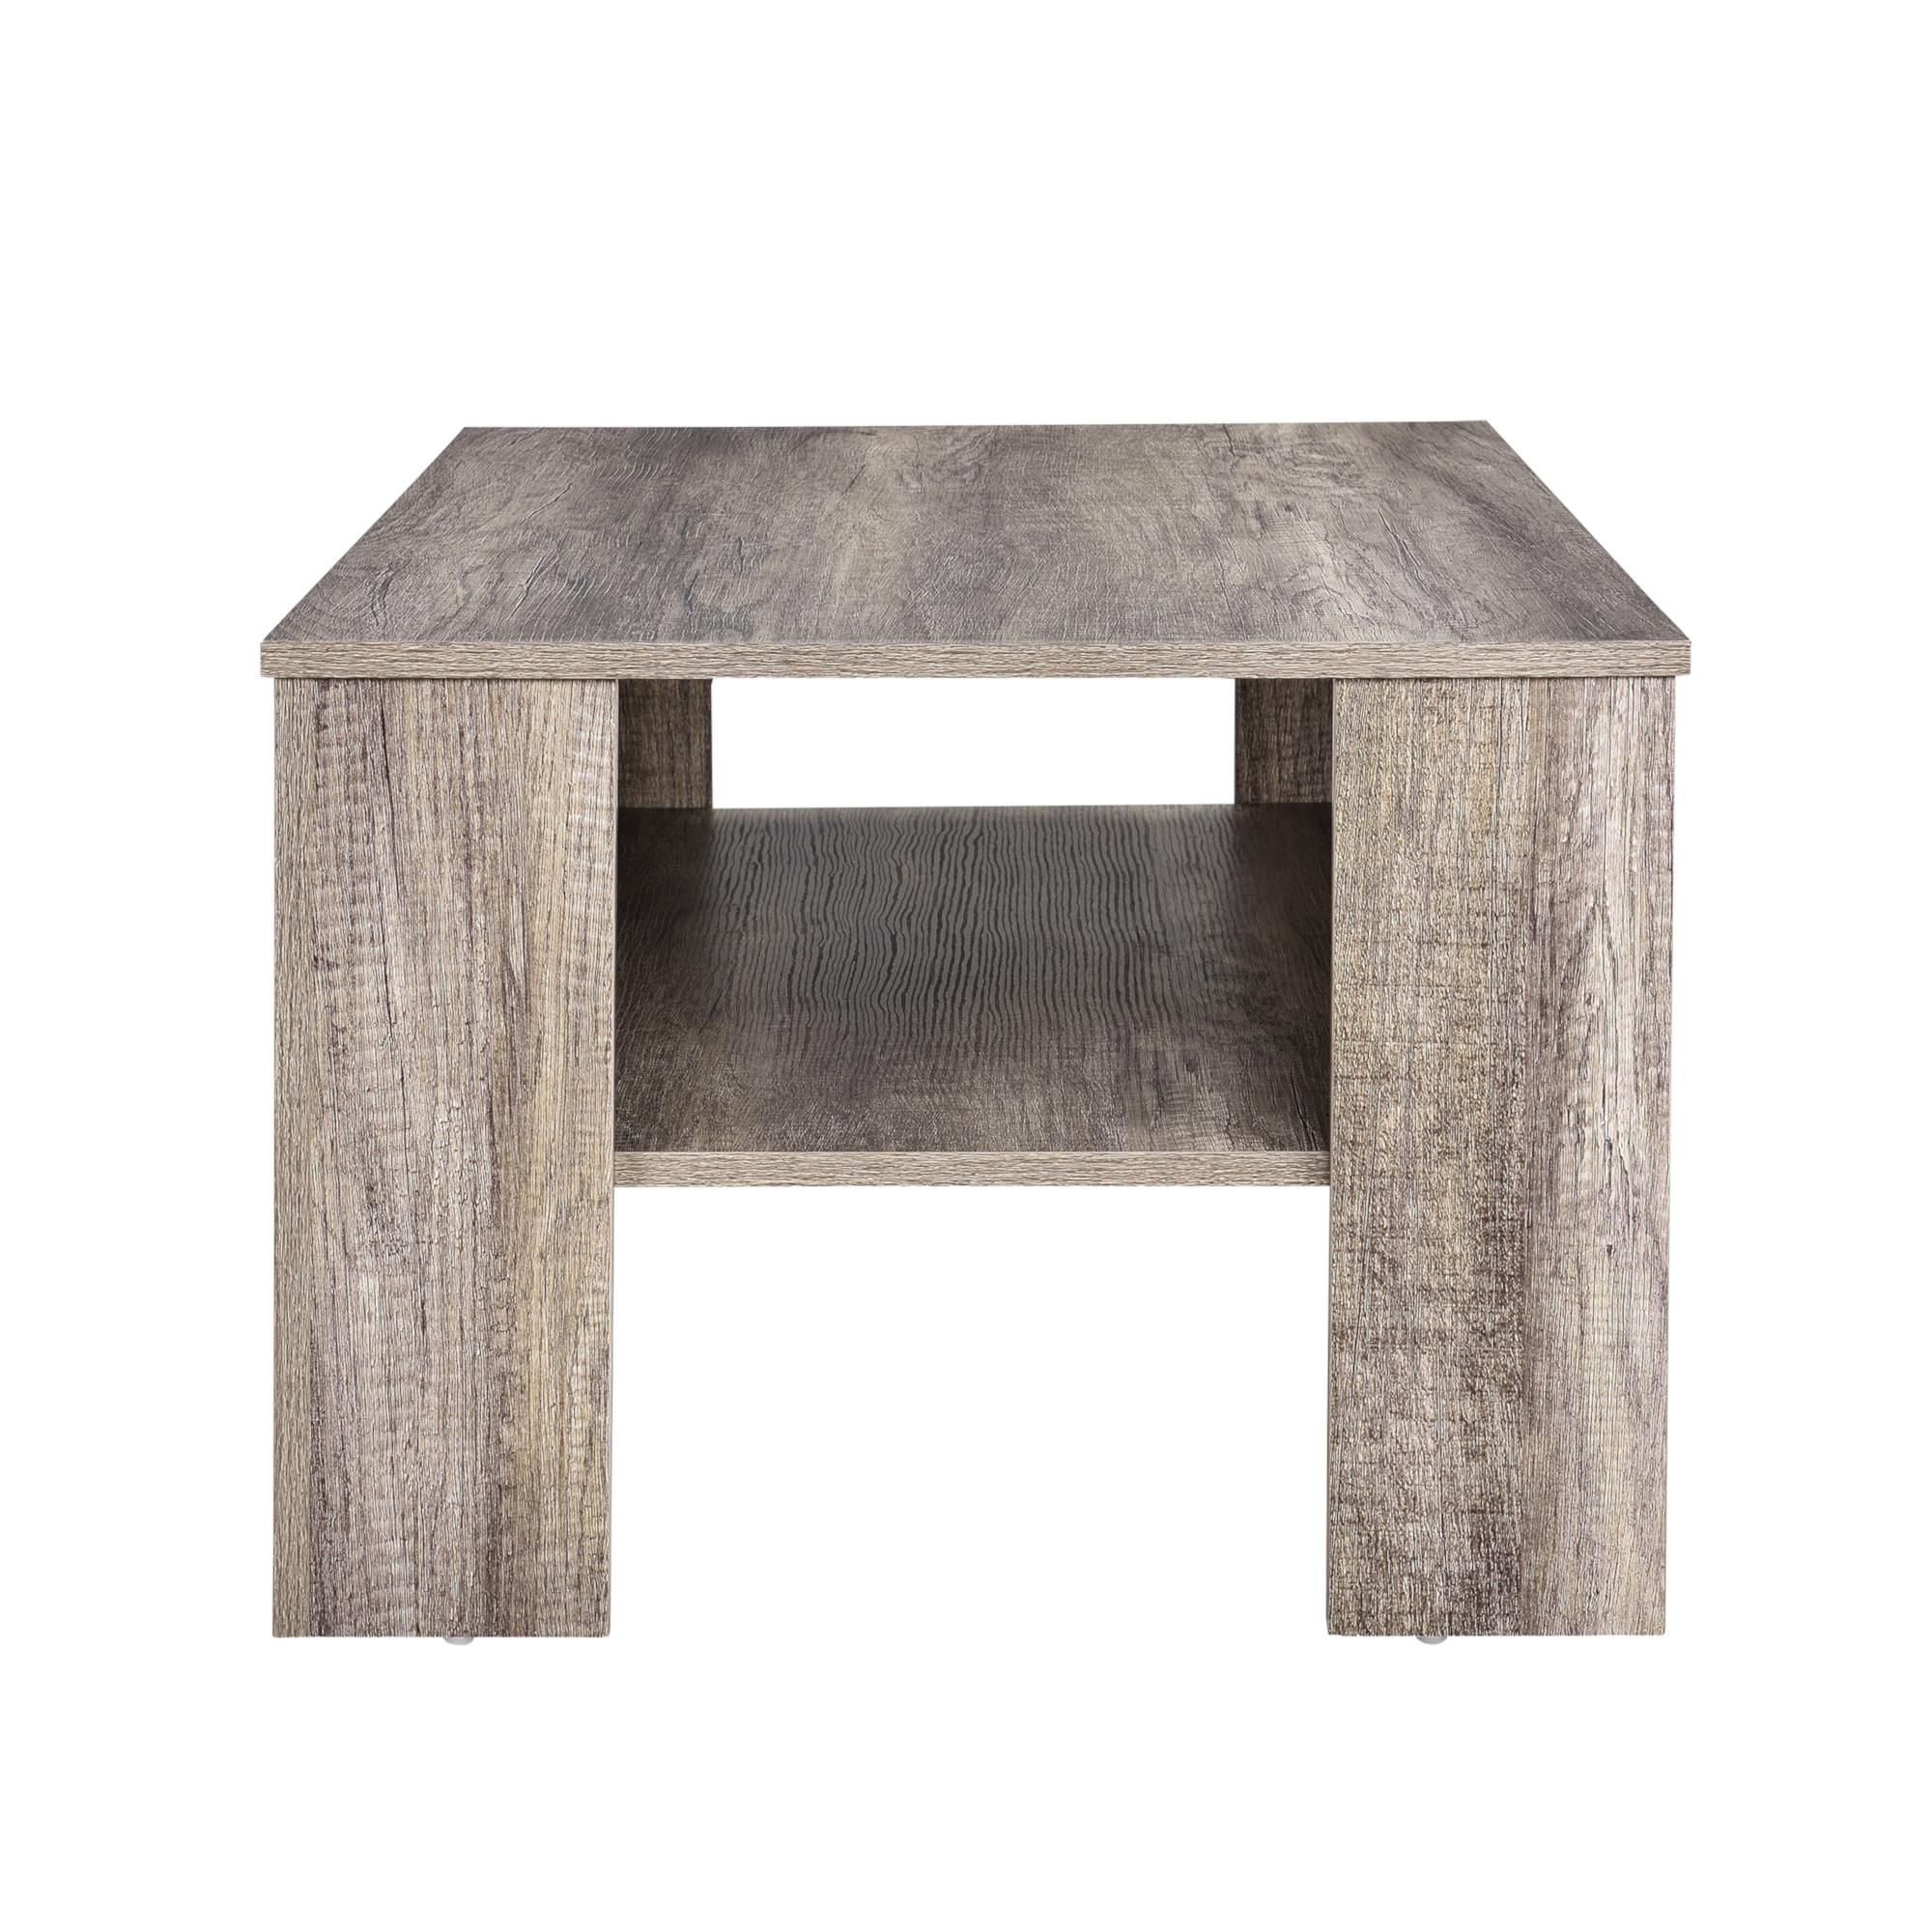 couchtisch eiche altholz 100x60cm. Black Bedroom Furniture Sets. Home Design Ideas